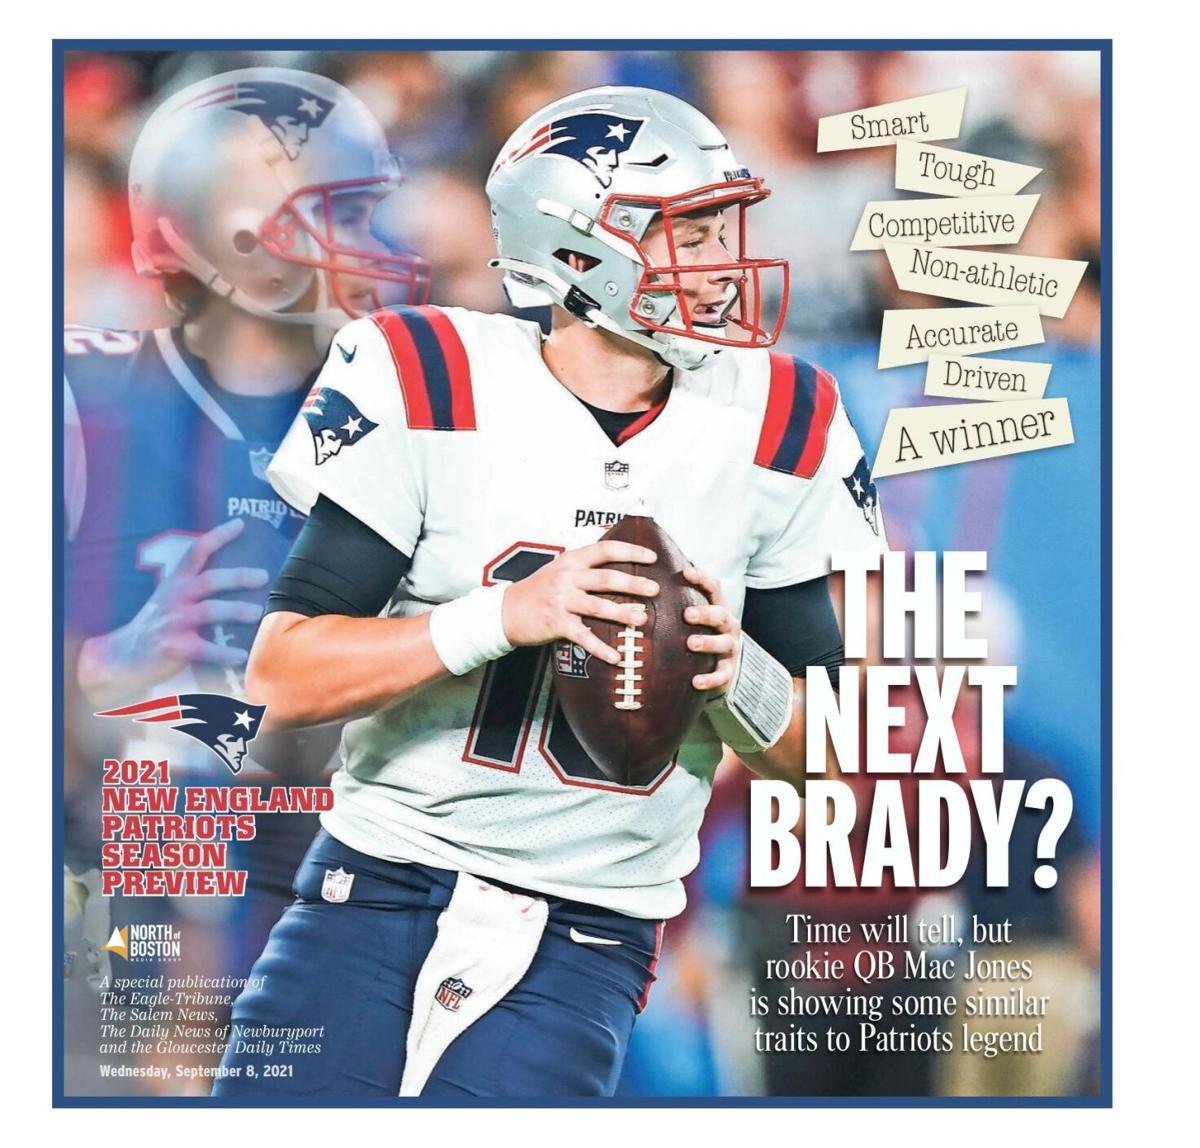 2021 New England Patriots Preview